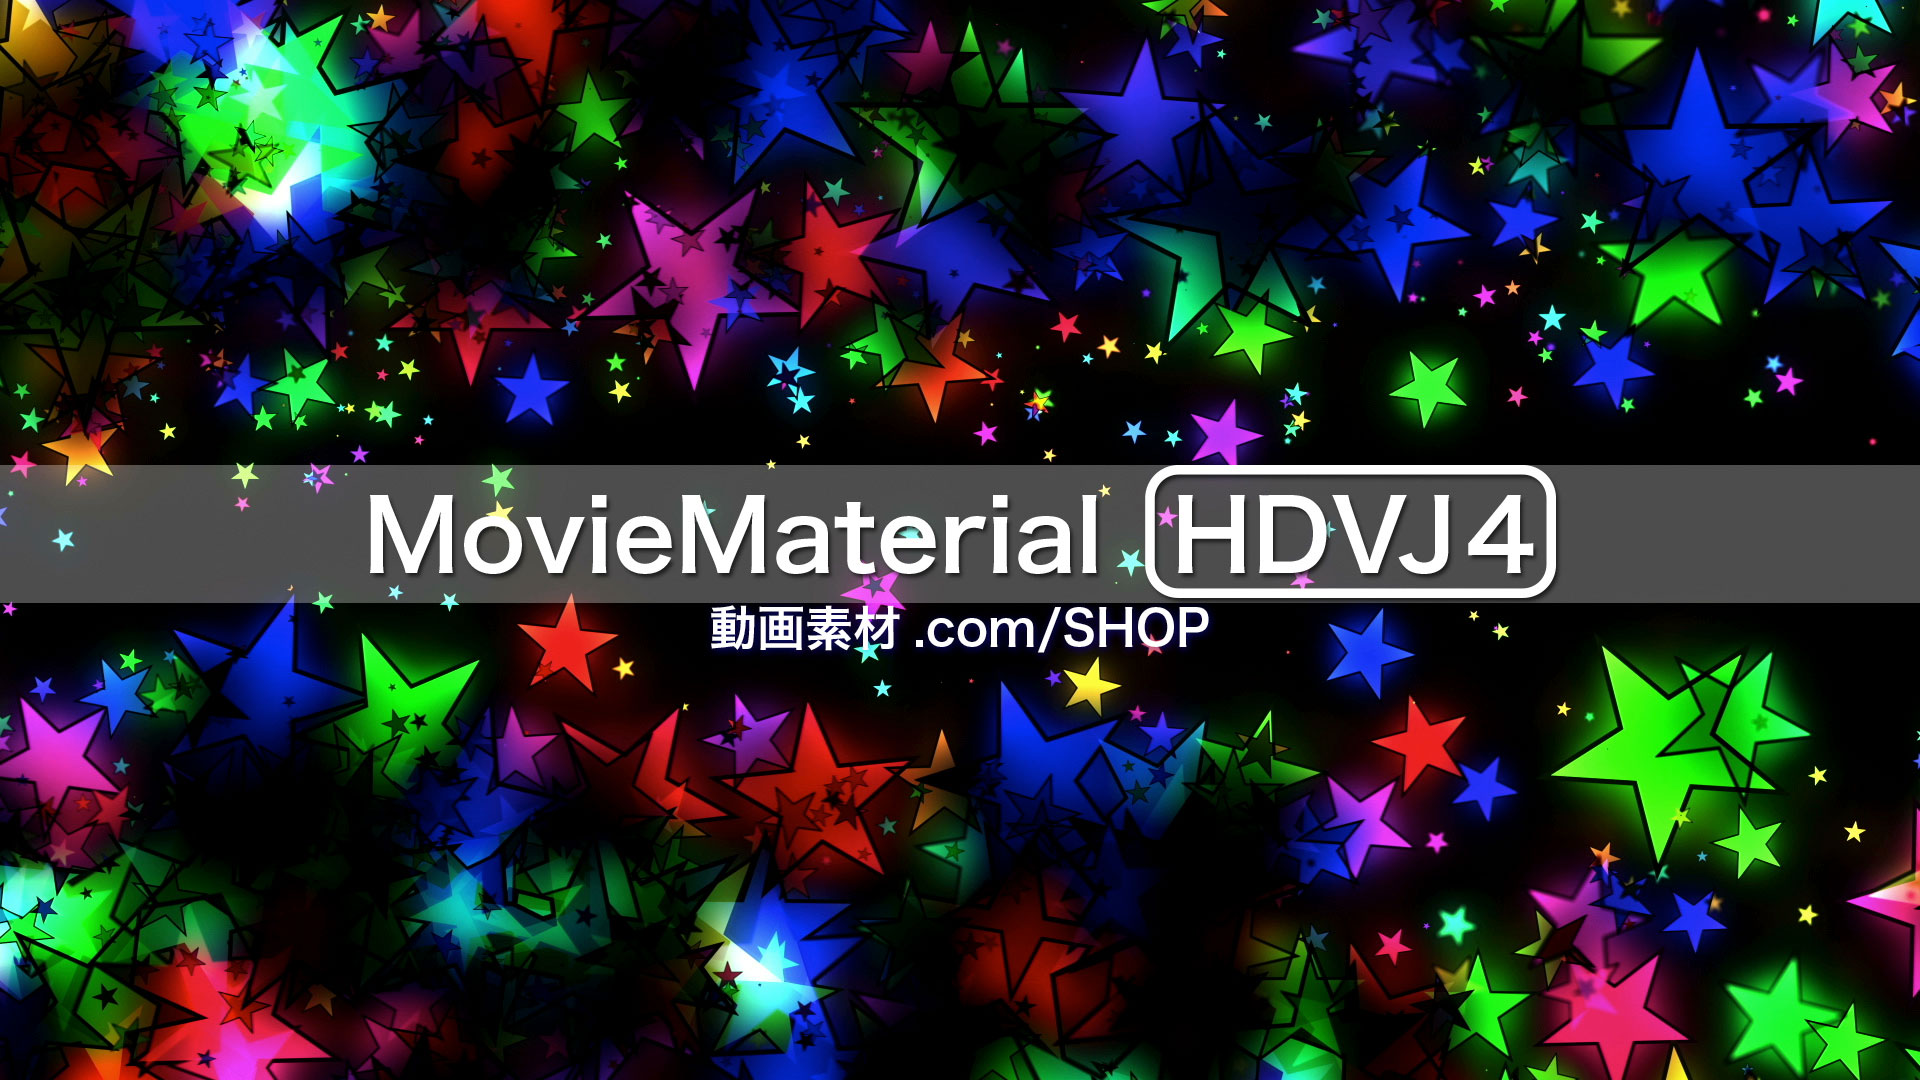 MovieMaterial HDVJ4 フルハイビジョンVJ動画素材集 画像7